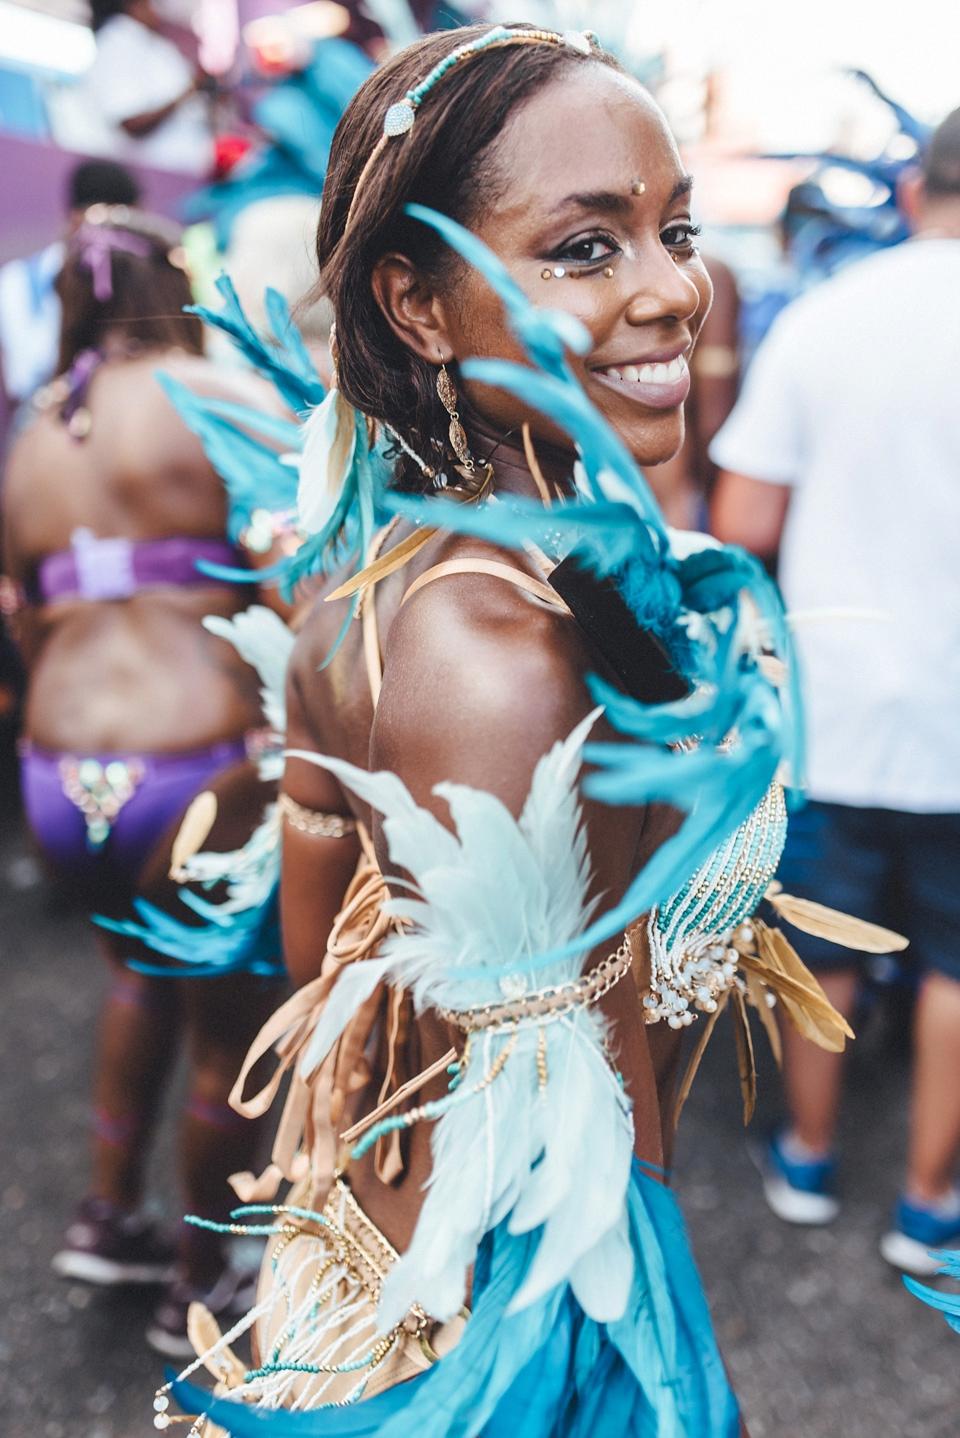 blog-wedding-photographer_0606 Niki & Kerron Wedding & Carnival Trinidad. Photo & FilmNiki & Kerron Wedding & Carnival Trinidad. Photo & Filmblog wedding photographer 0606